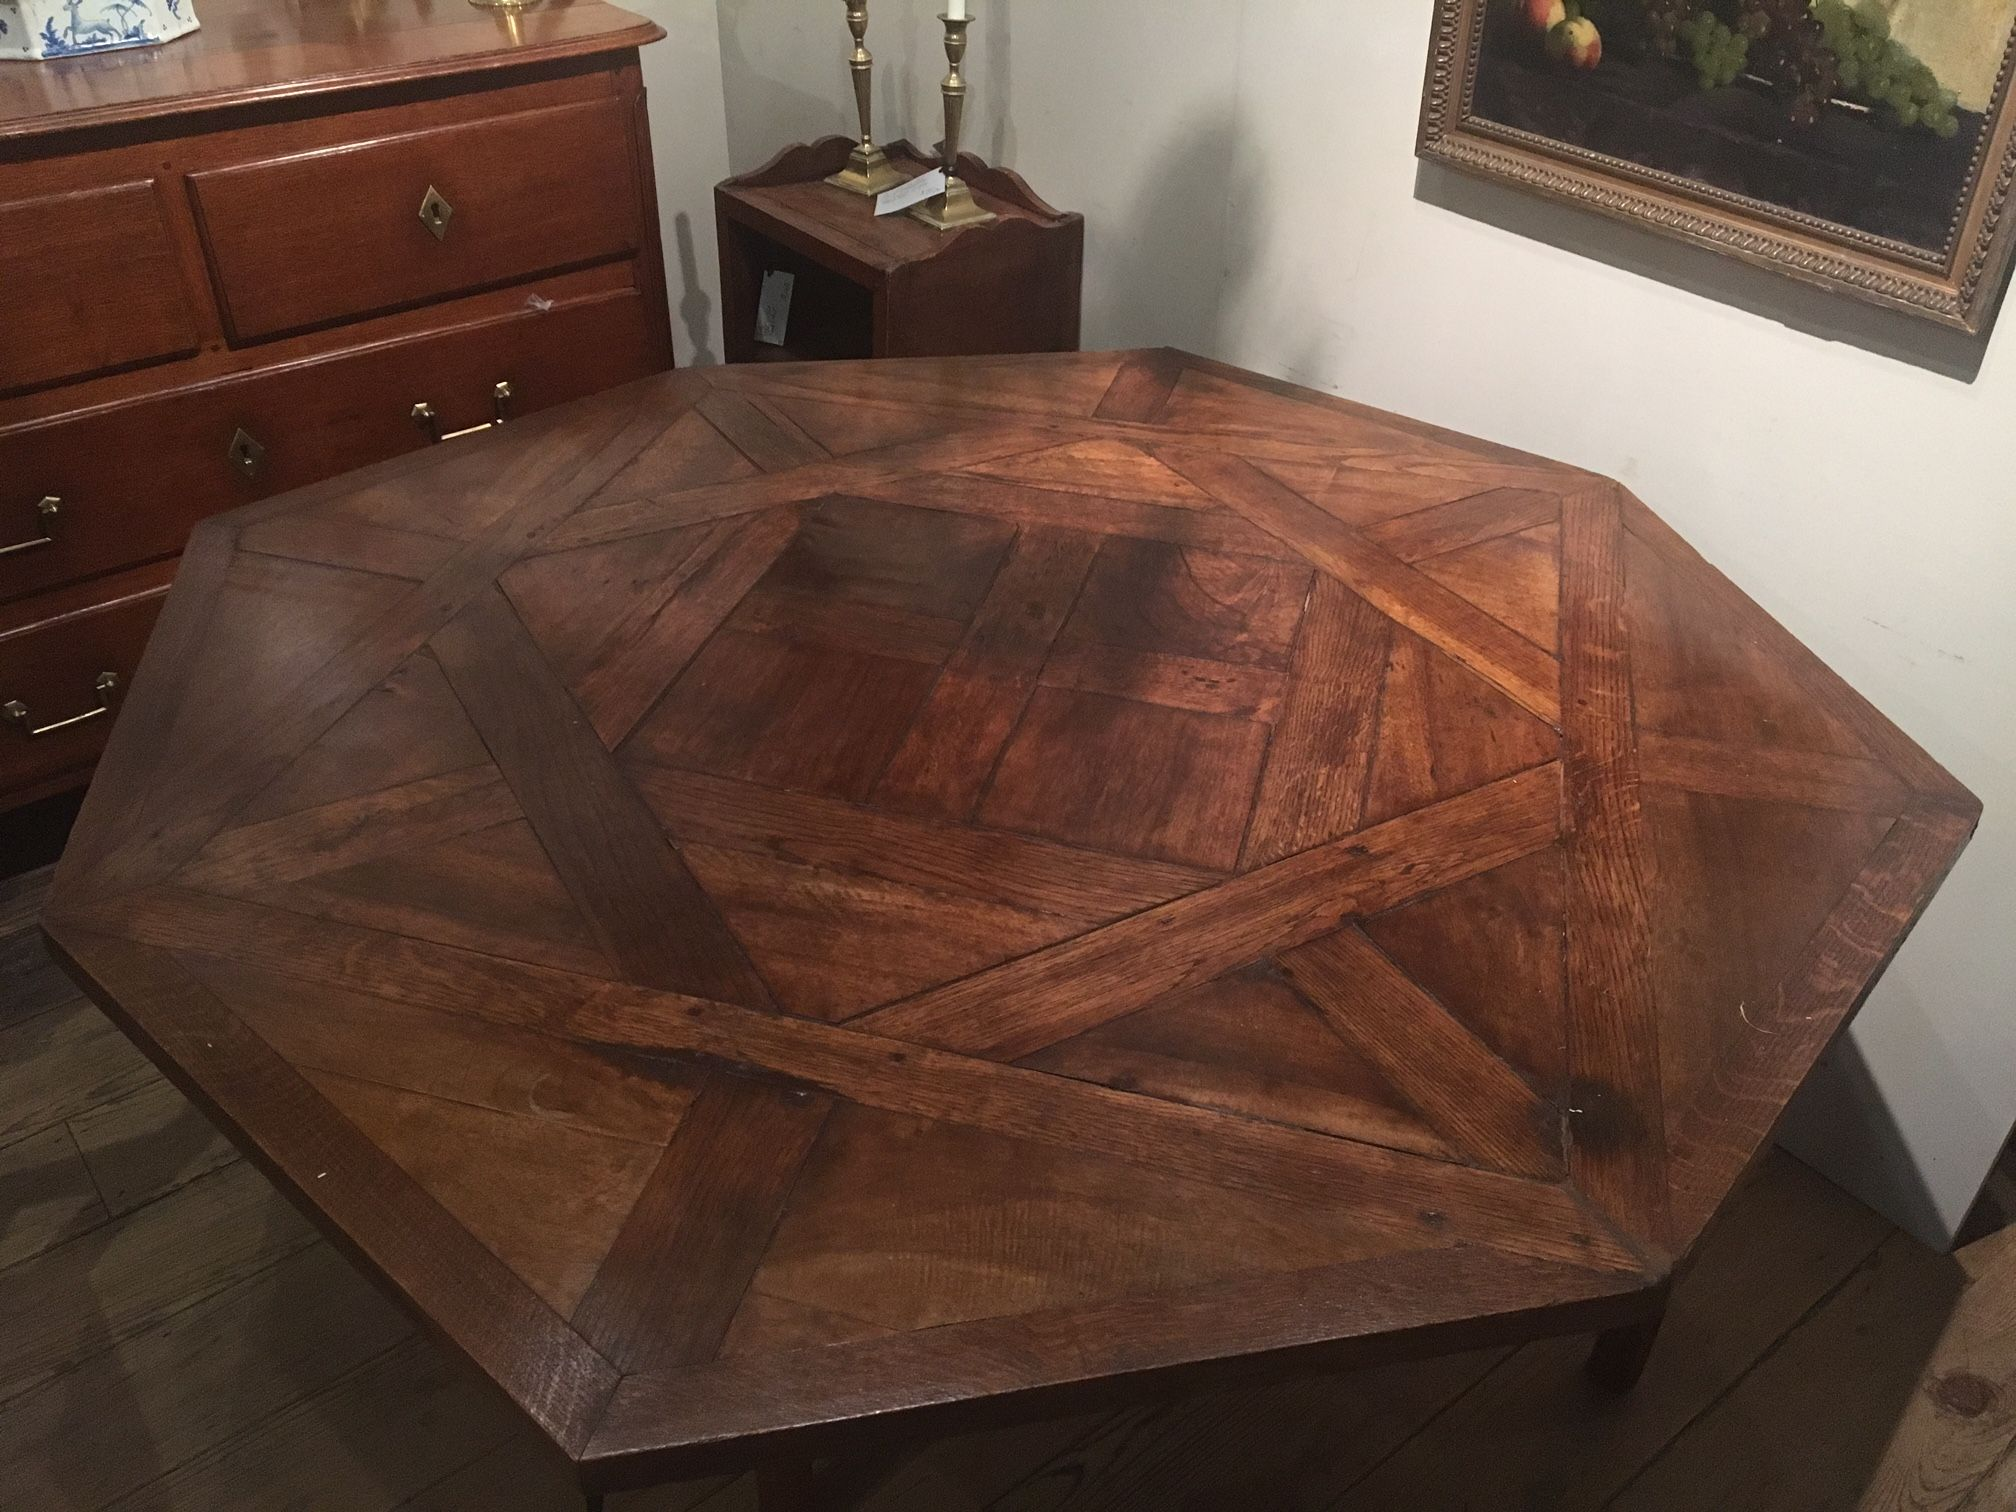 Walnut parquet table top 18C  http://auvieuxparisantiques.com/product-category/tables/  #table #Walnutparquet #tabletop #beauty #antique #antiquetable